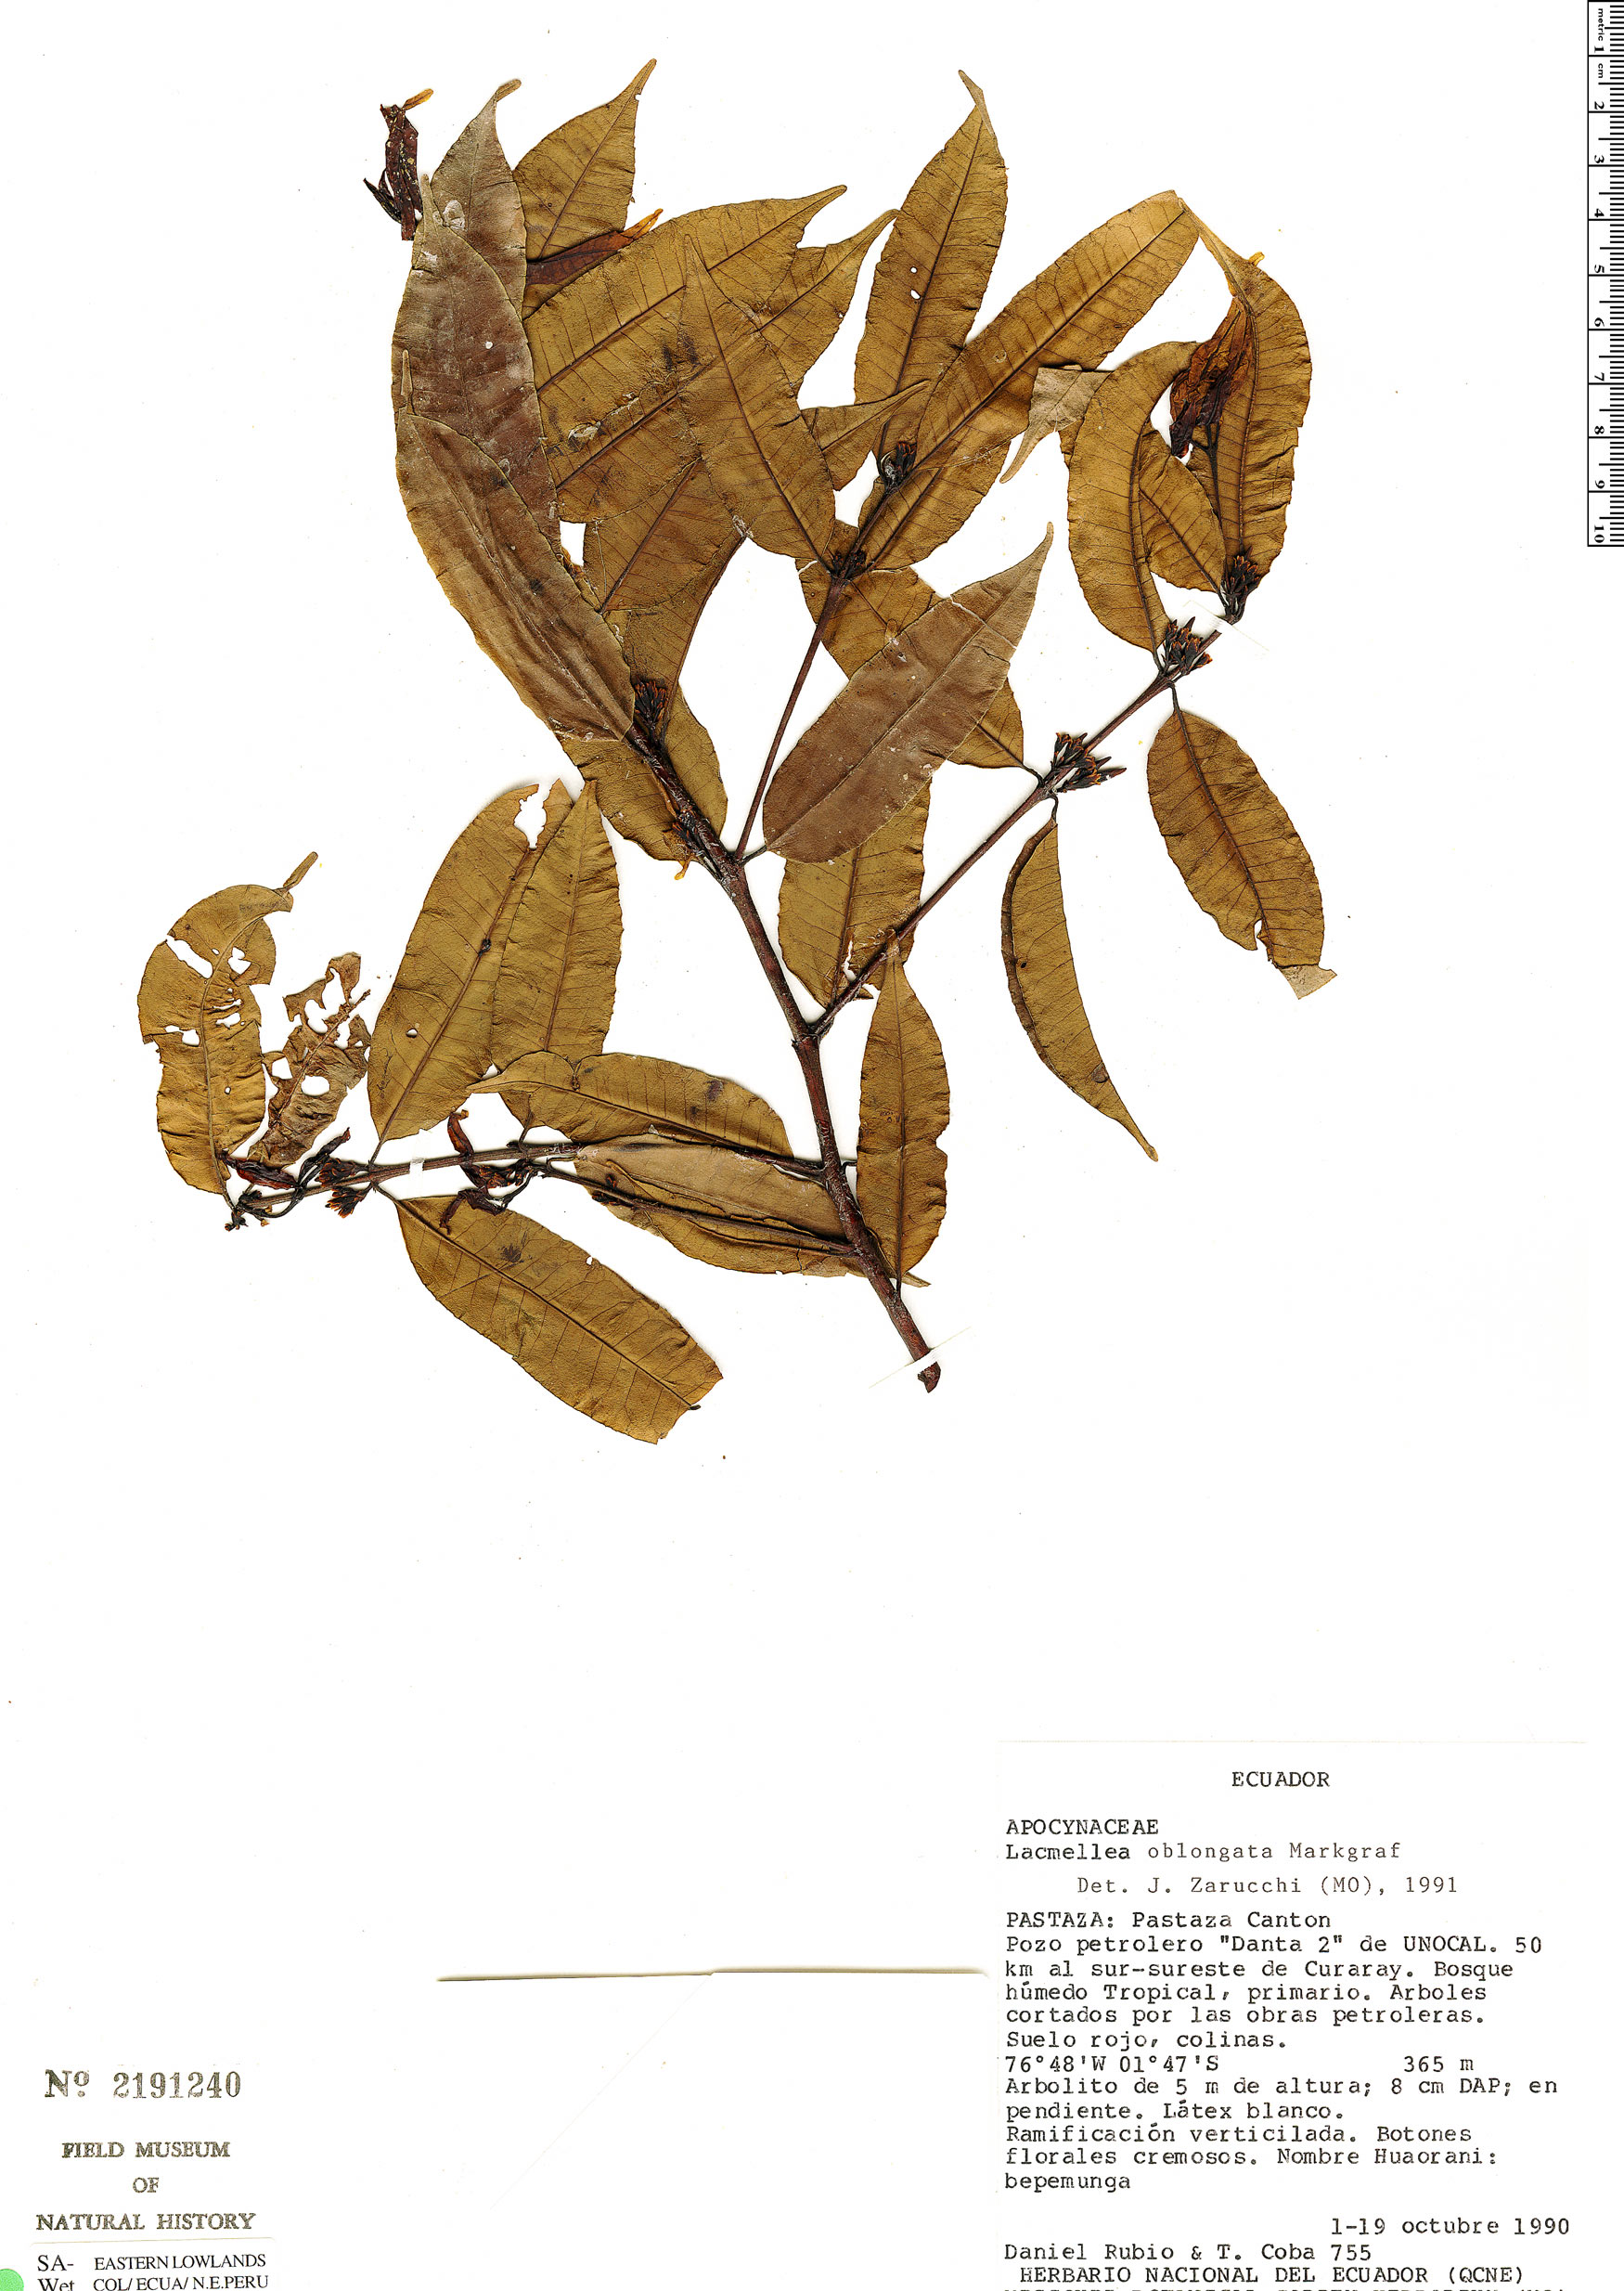 Specimen: Lacmellea oblongata